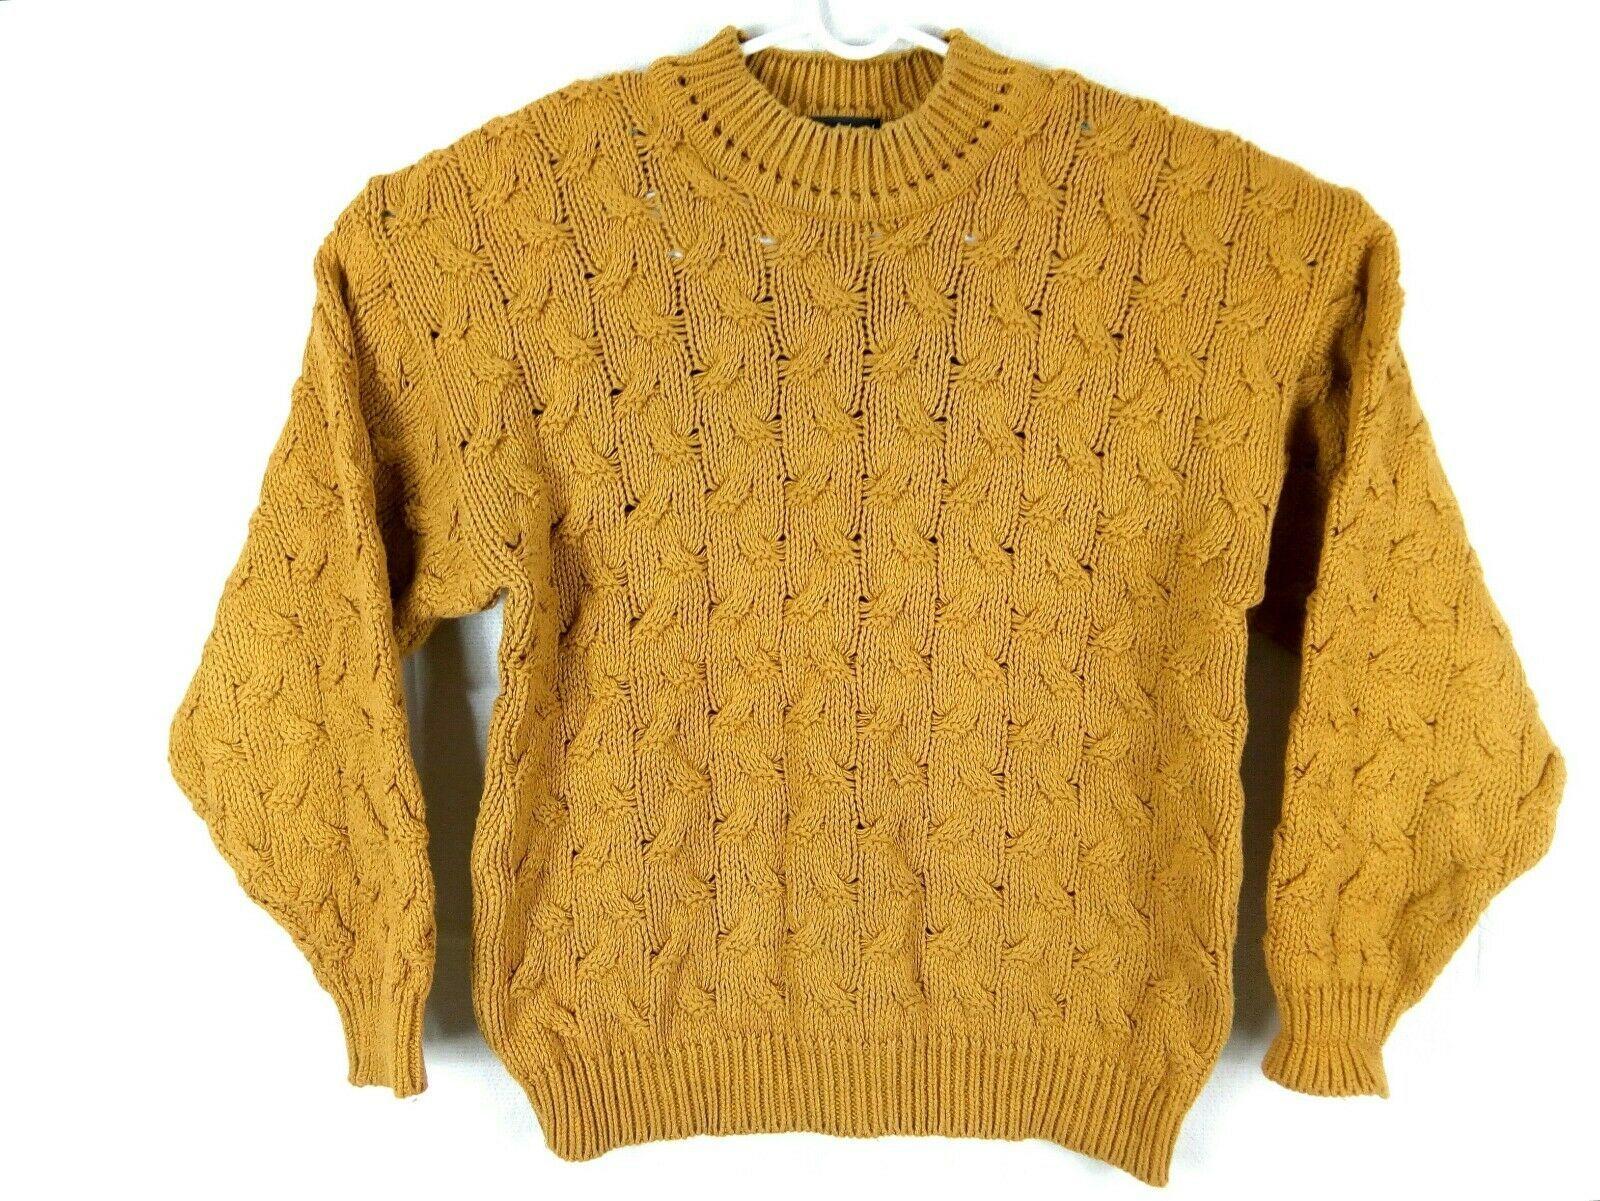 Vtg Ellis Island Men Sweater XL Mustard Yellow Crewneck Chunky Cardigan Pullove